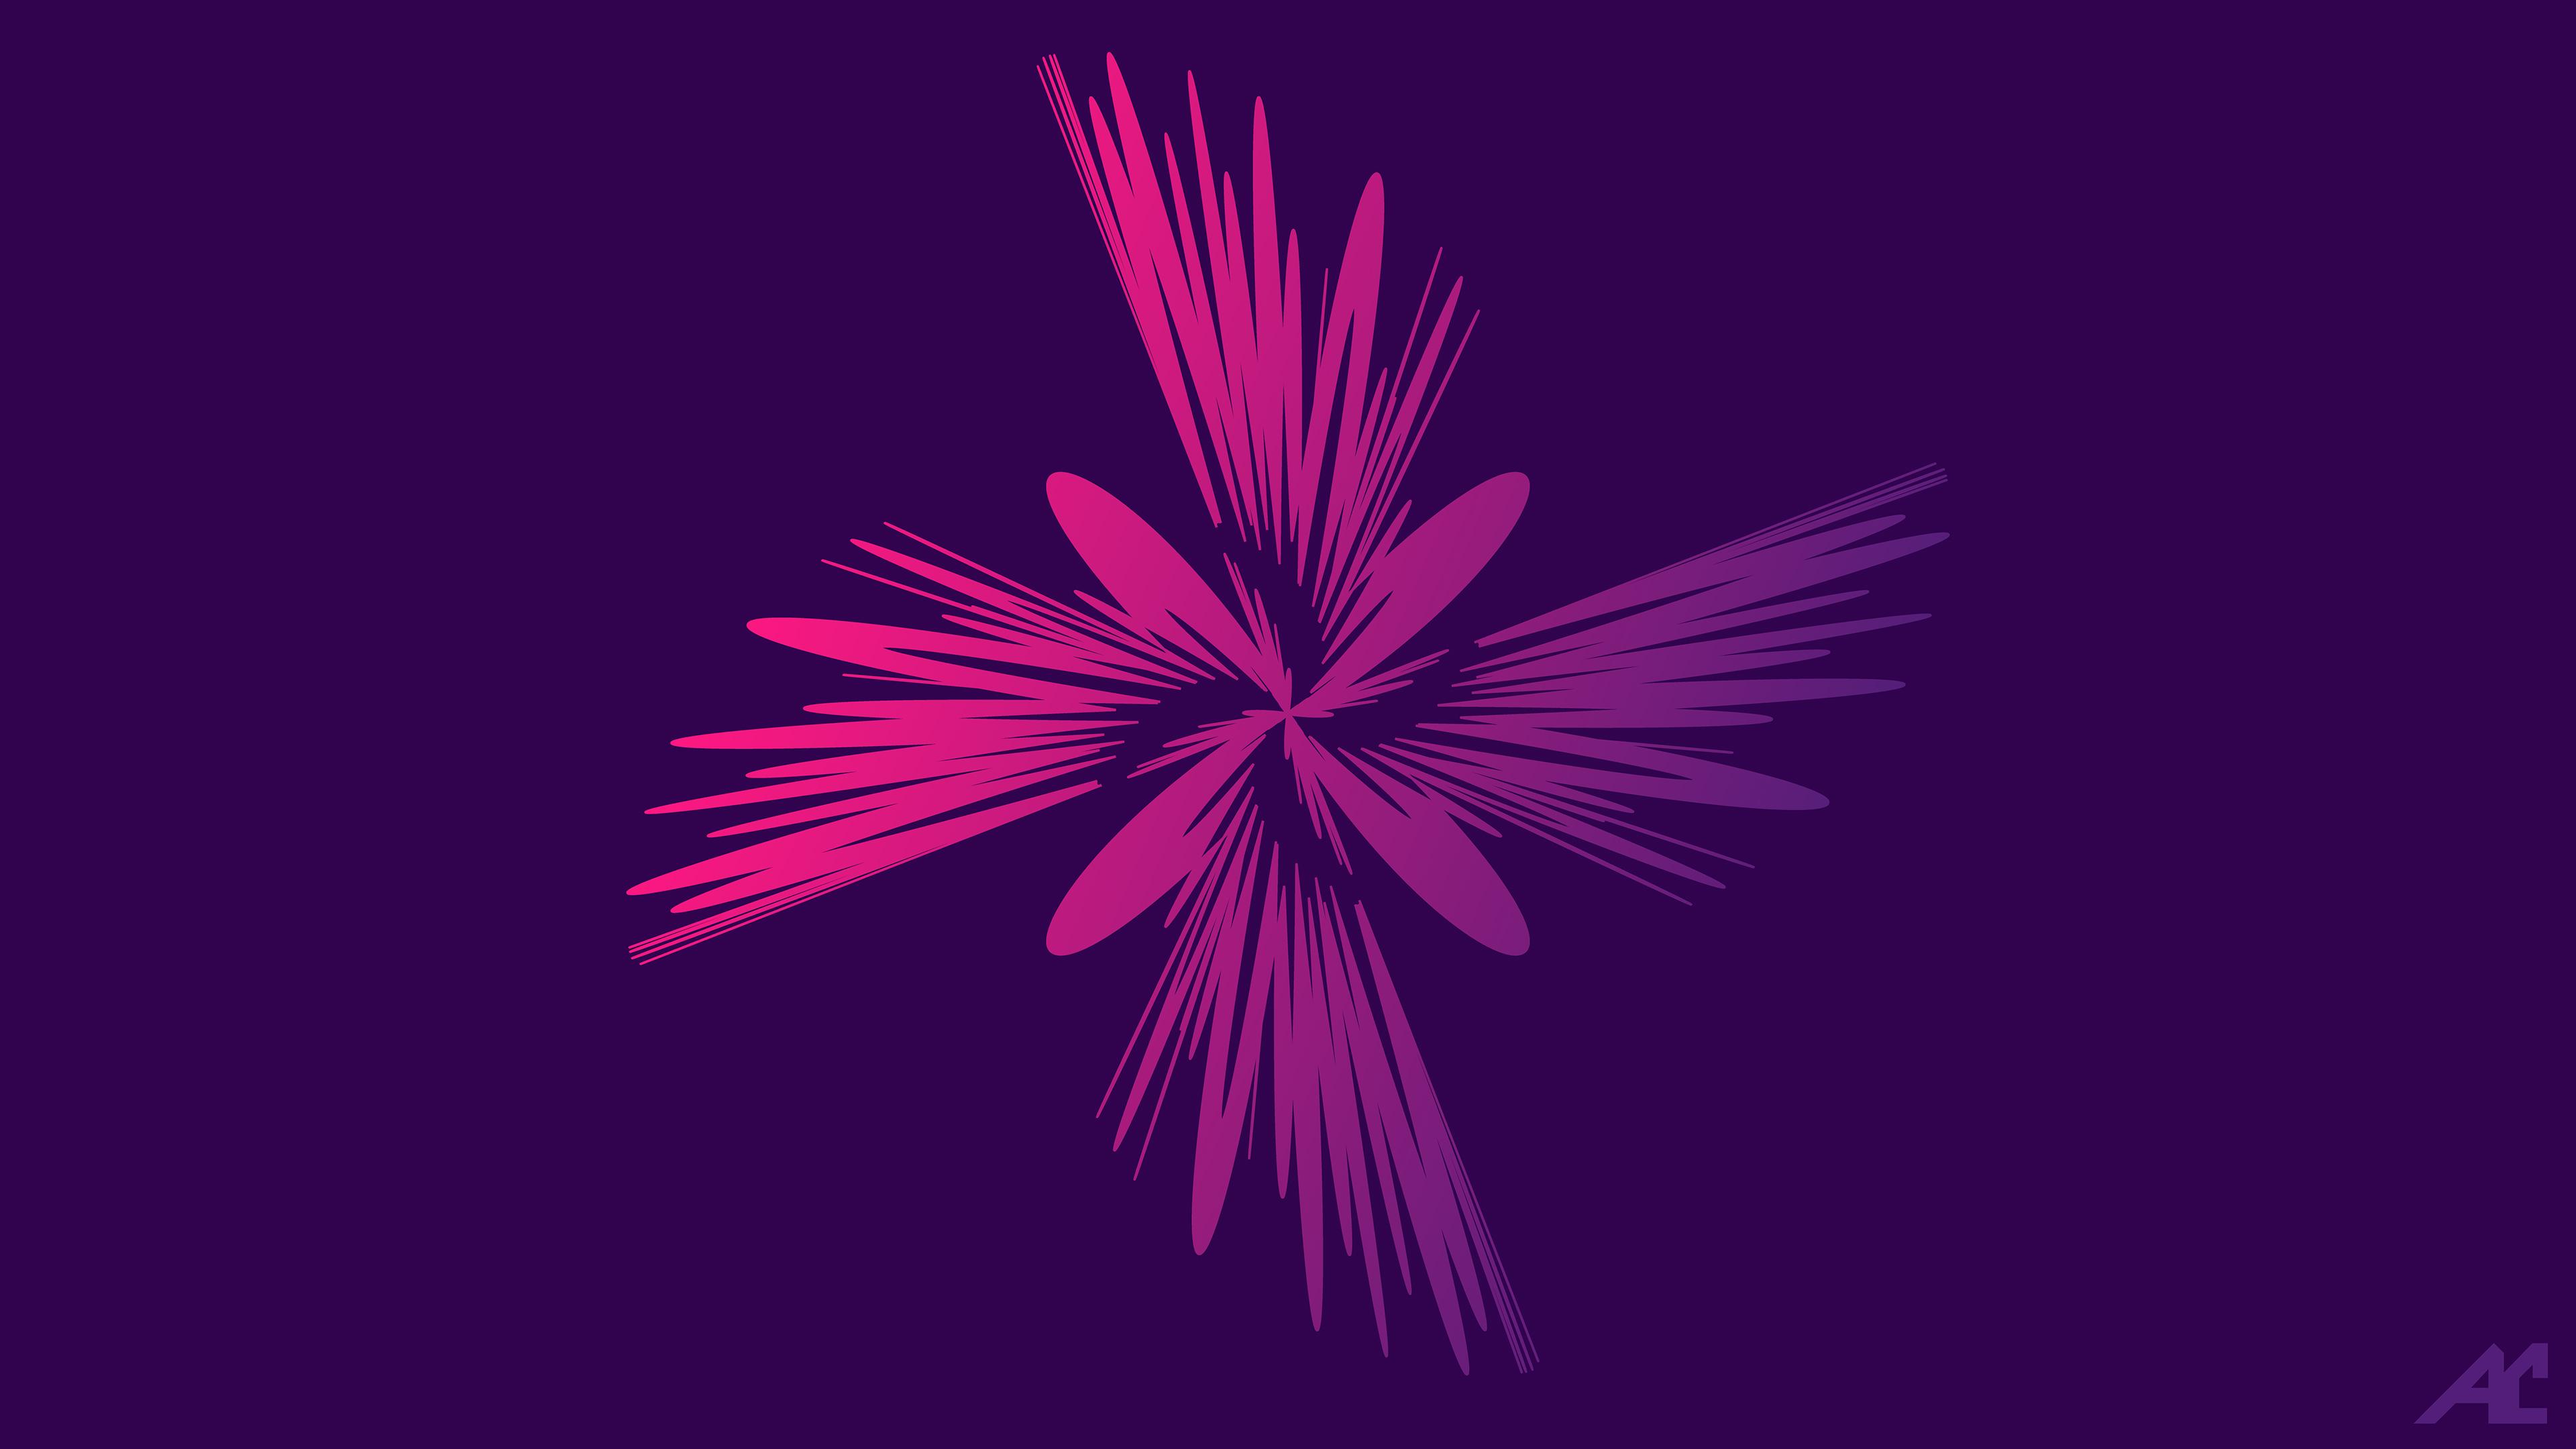 1360x768 Flower Abstract 4k Laptop Hd Hd 4k Wallpapers